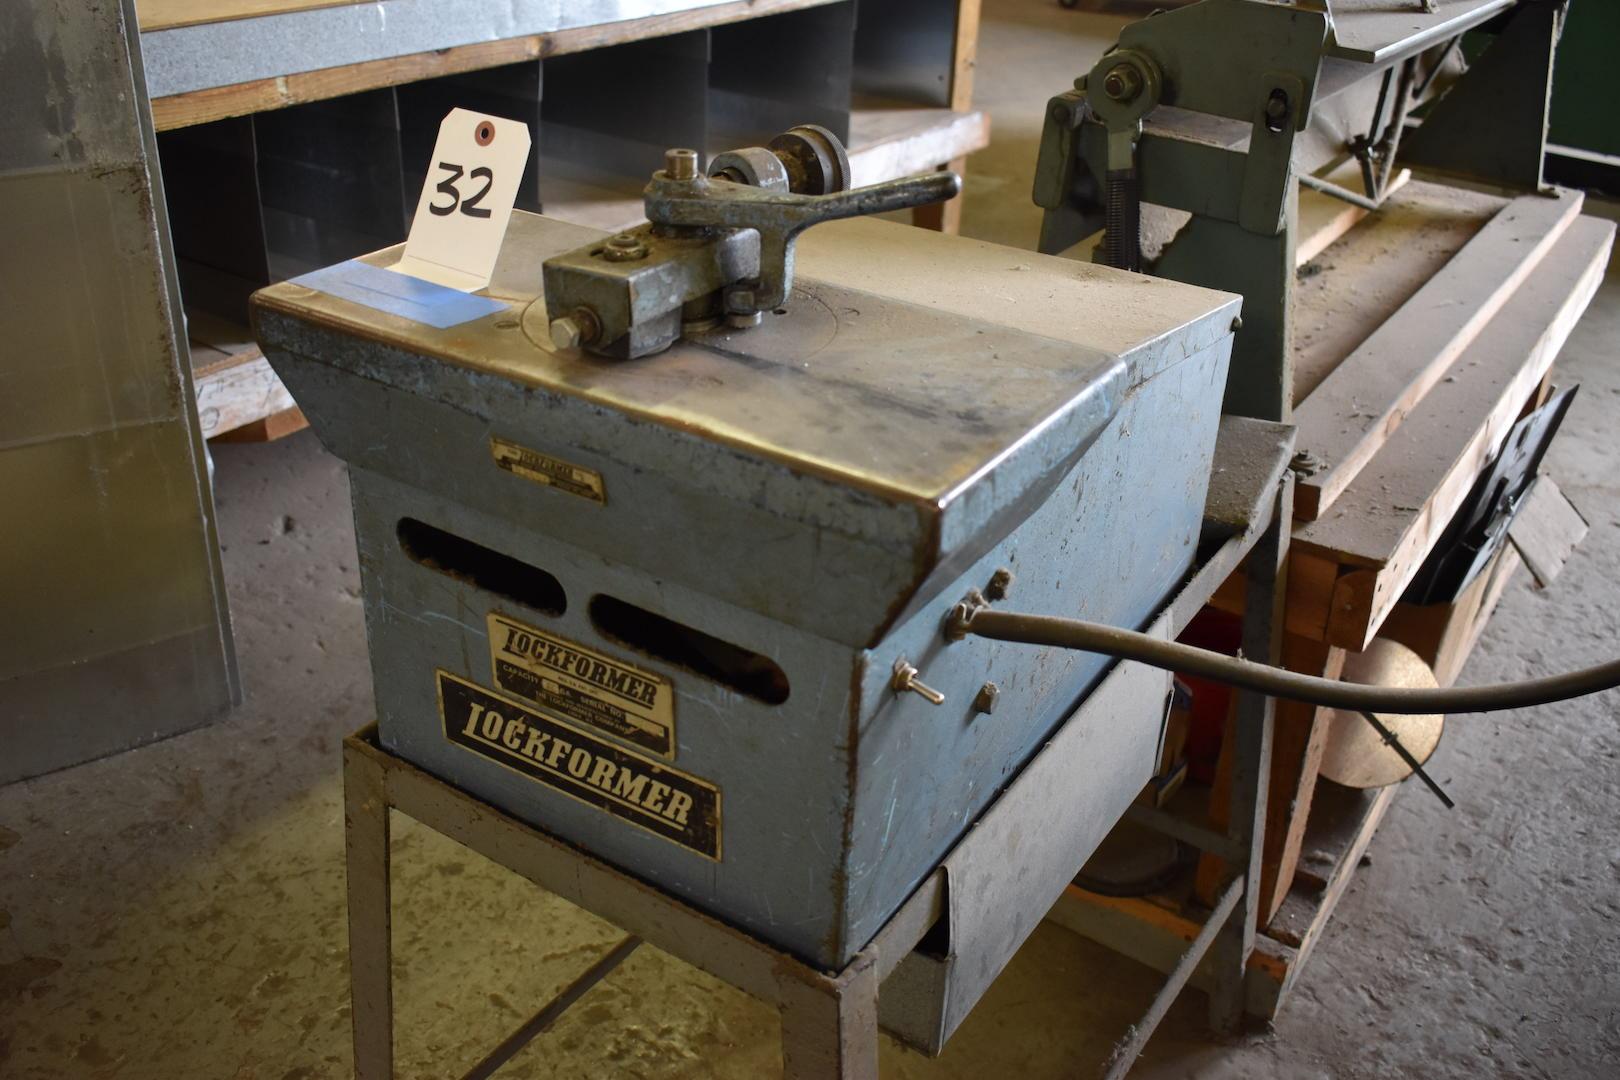 Lot 32 - Lockformer 20 ga. Flanging Attachment, S/N 65862